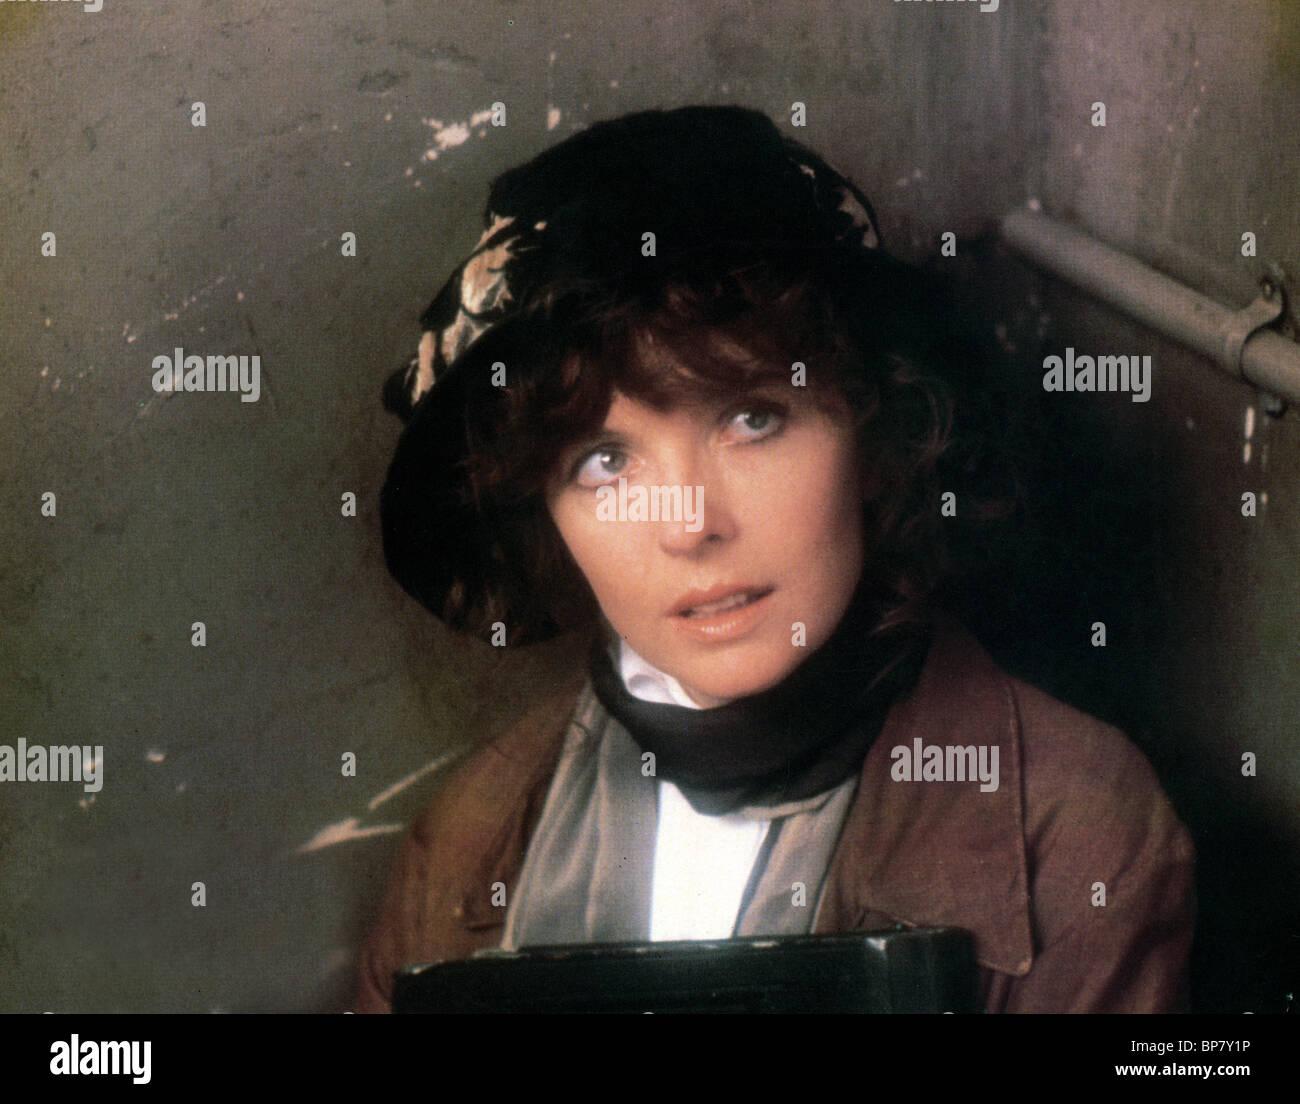 DIANE KEATON REDS (1981) - Stock Image